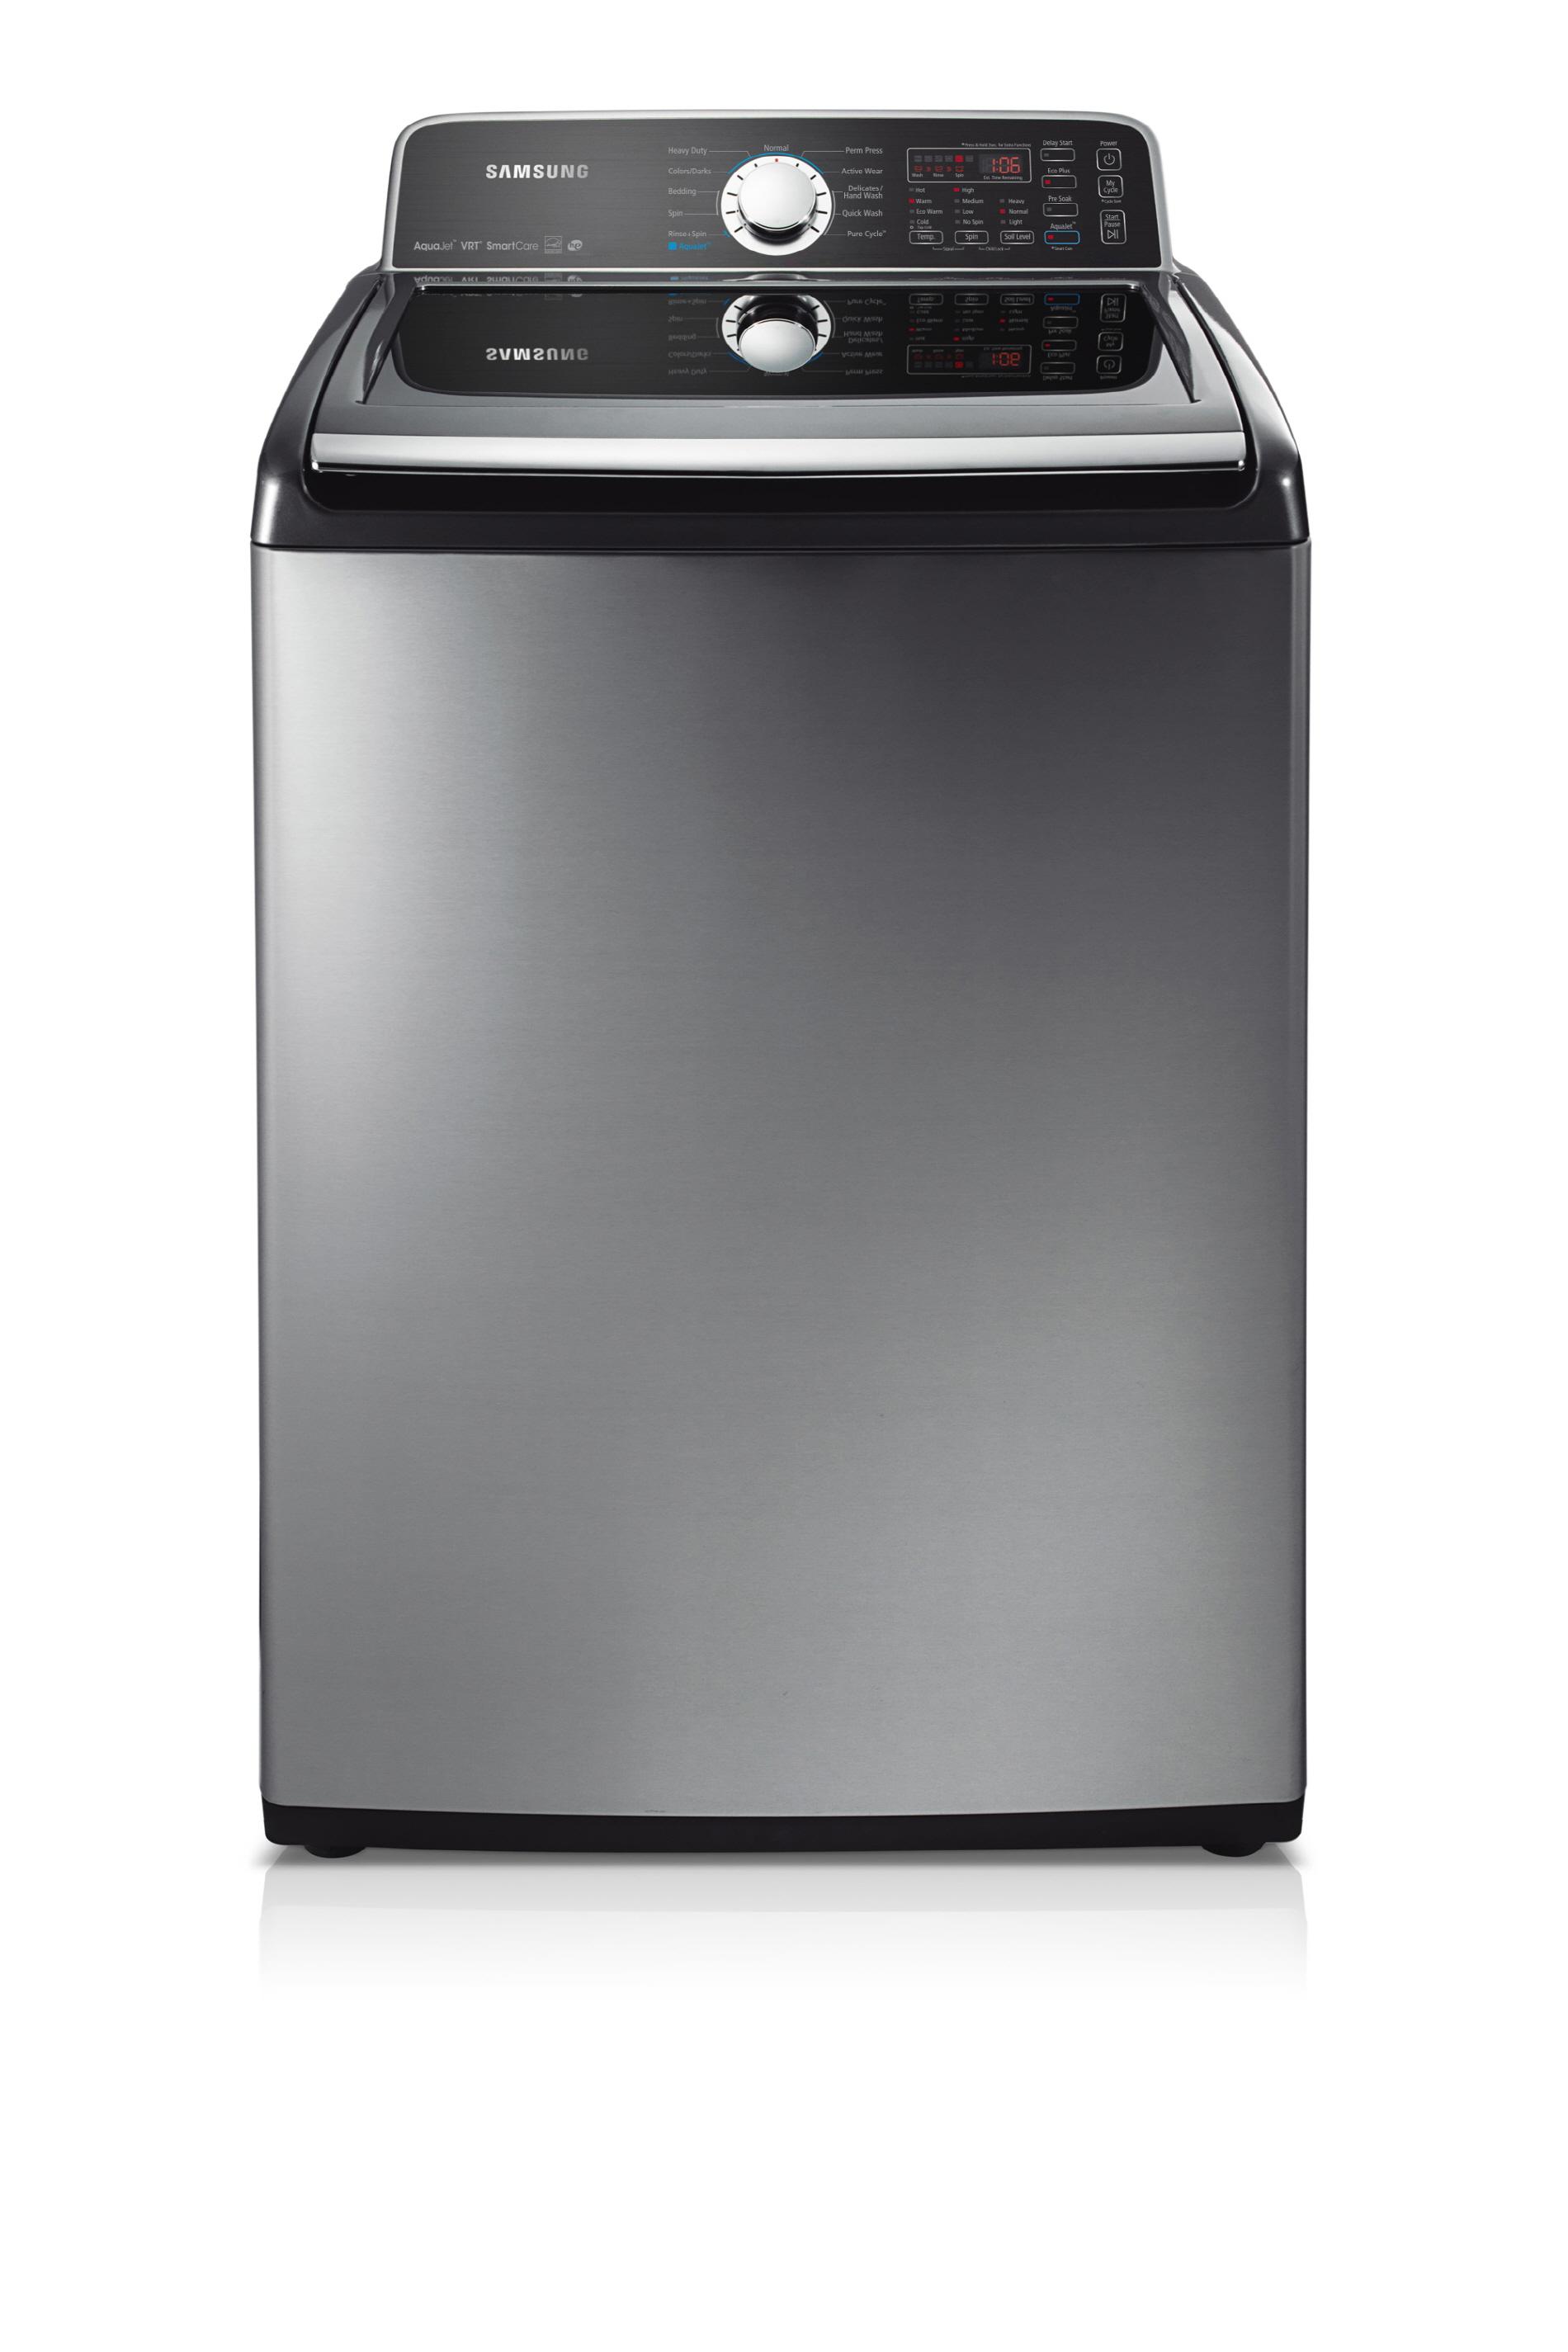 Samsung Washing Machine Wins Sustainable Product